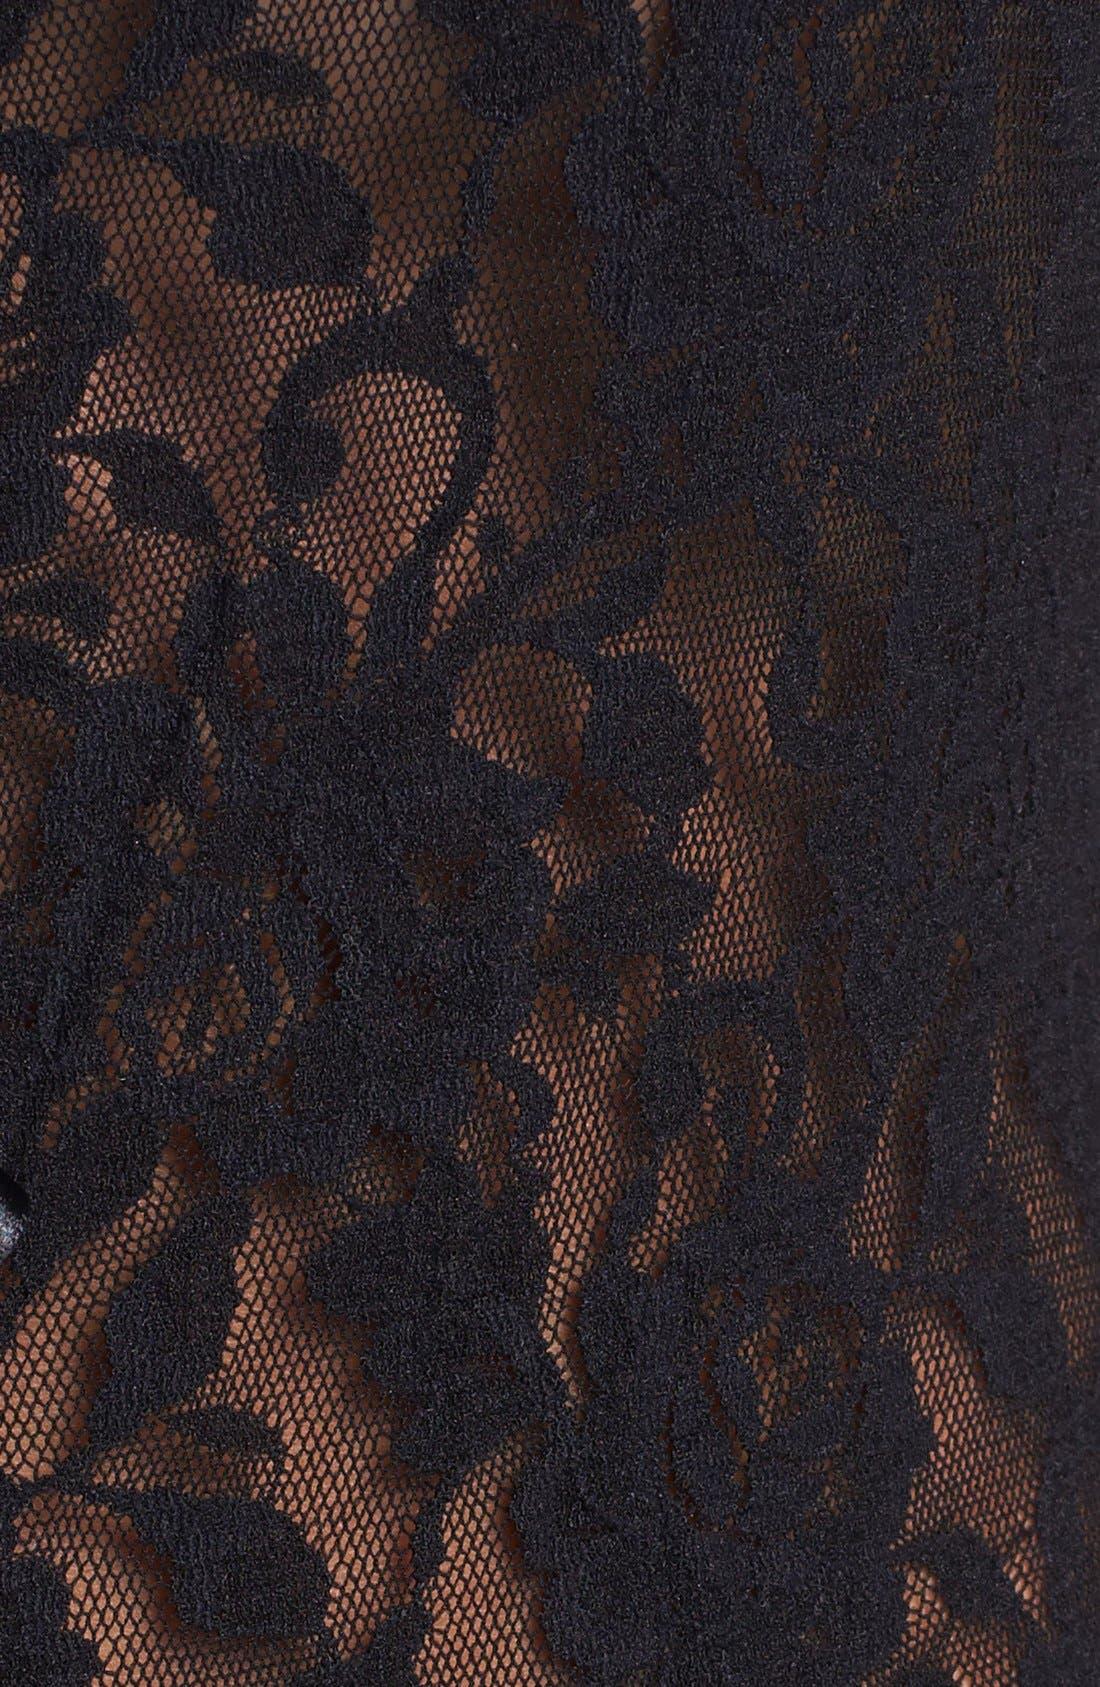 HANKY PANKY, 'Signature Lace' Open Gusset Teddy, Alternate thumbnail 8, color, BLACK